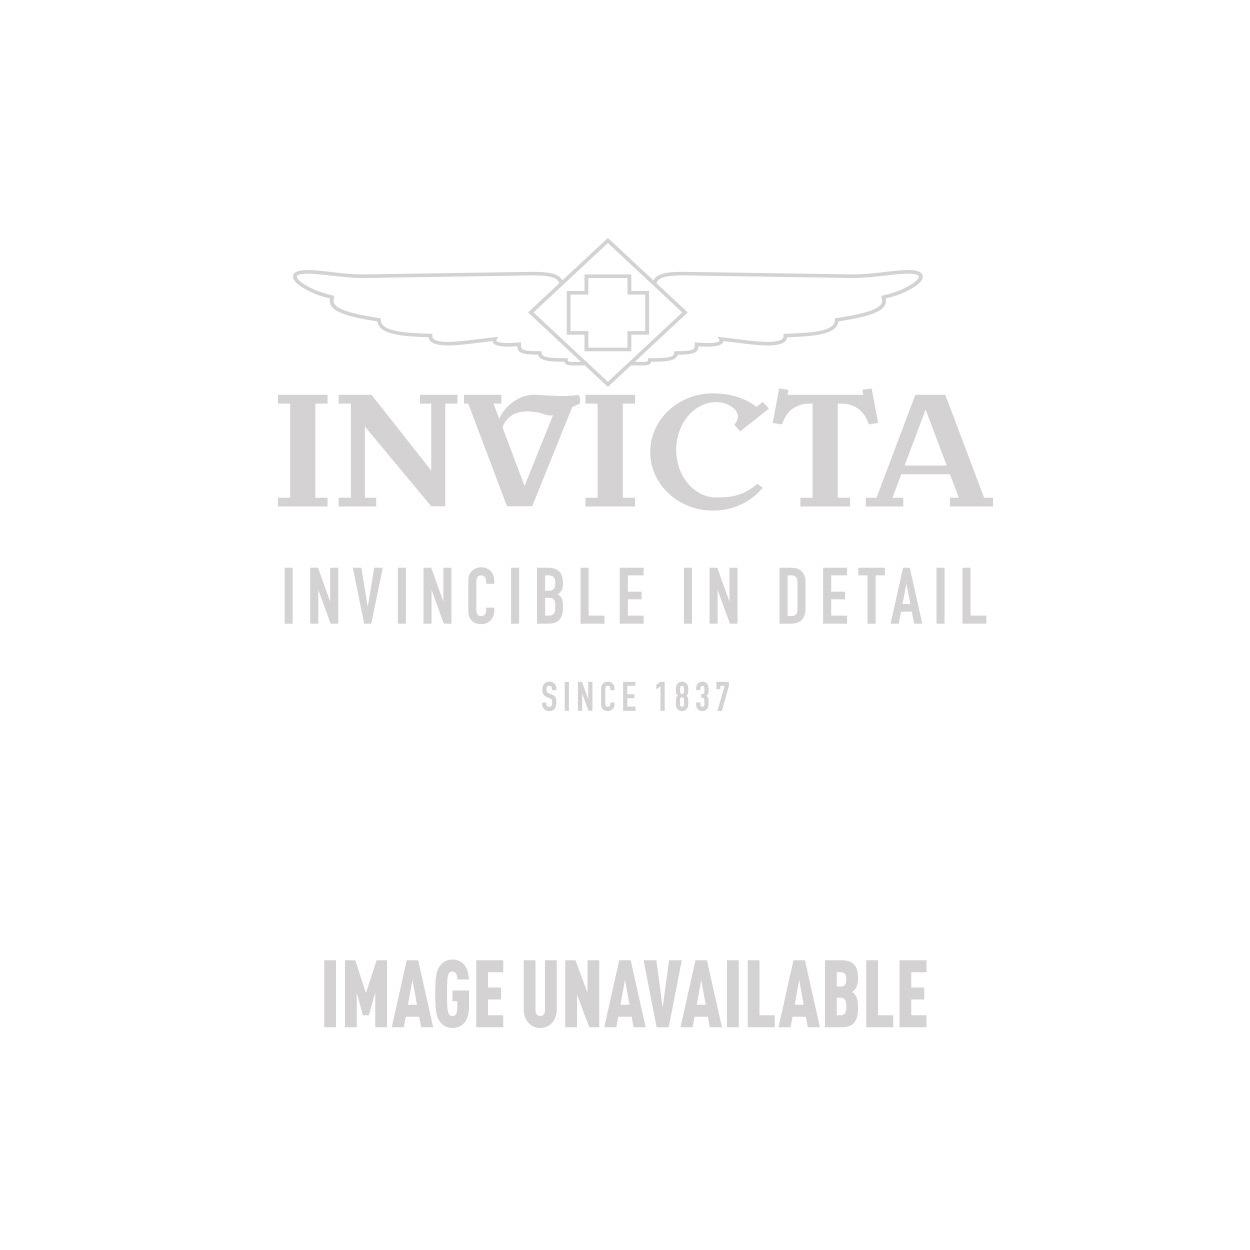 Invicta Excursion Mens Quartz 49.5mm Black, Gold Case Black Dial - Model 23906